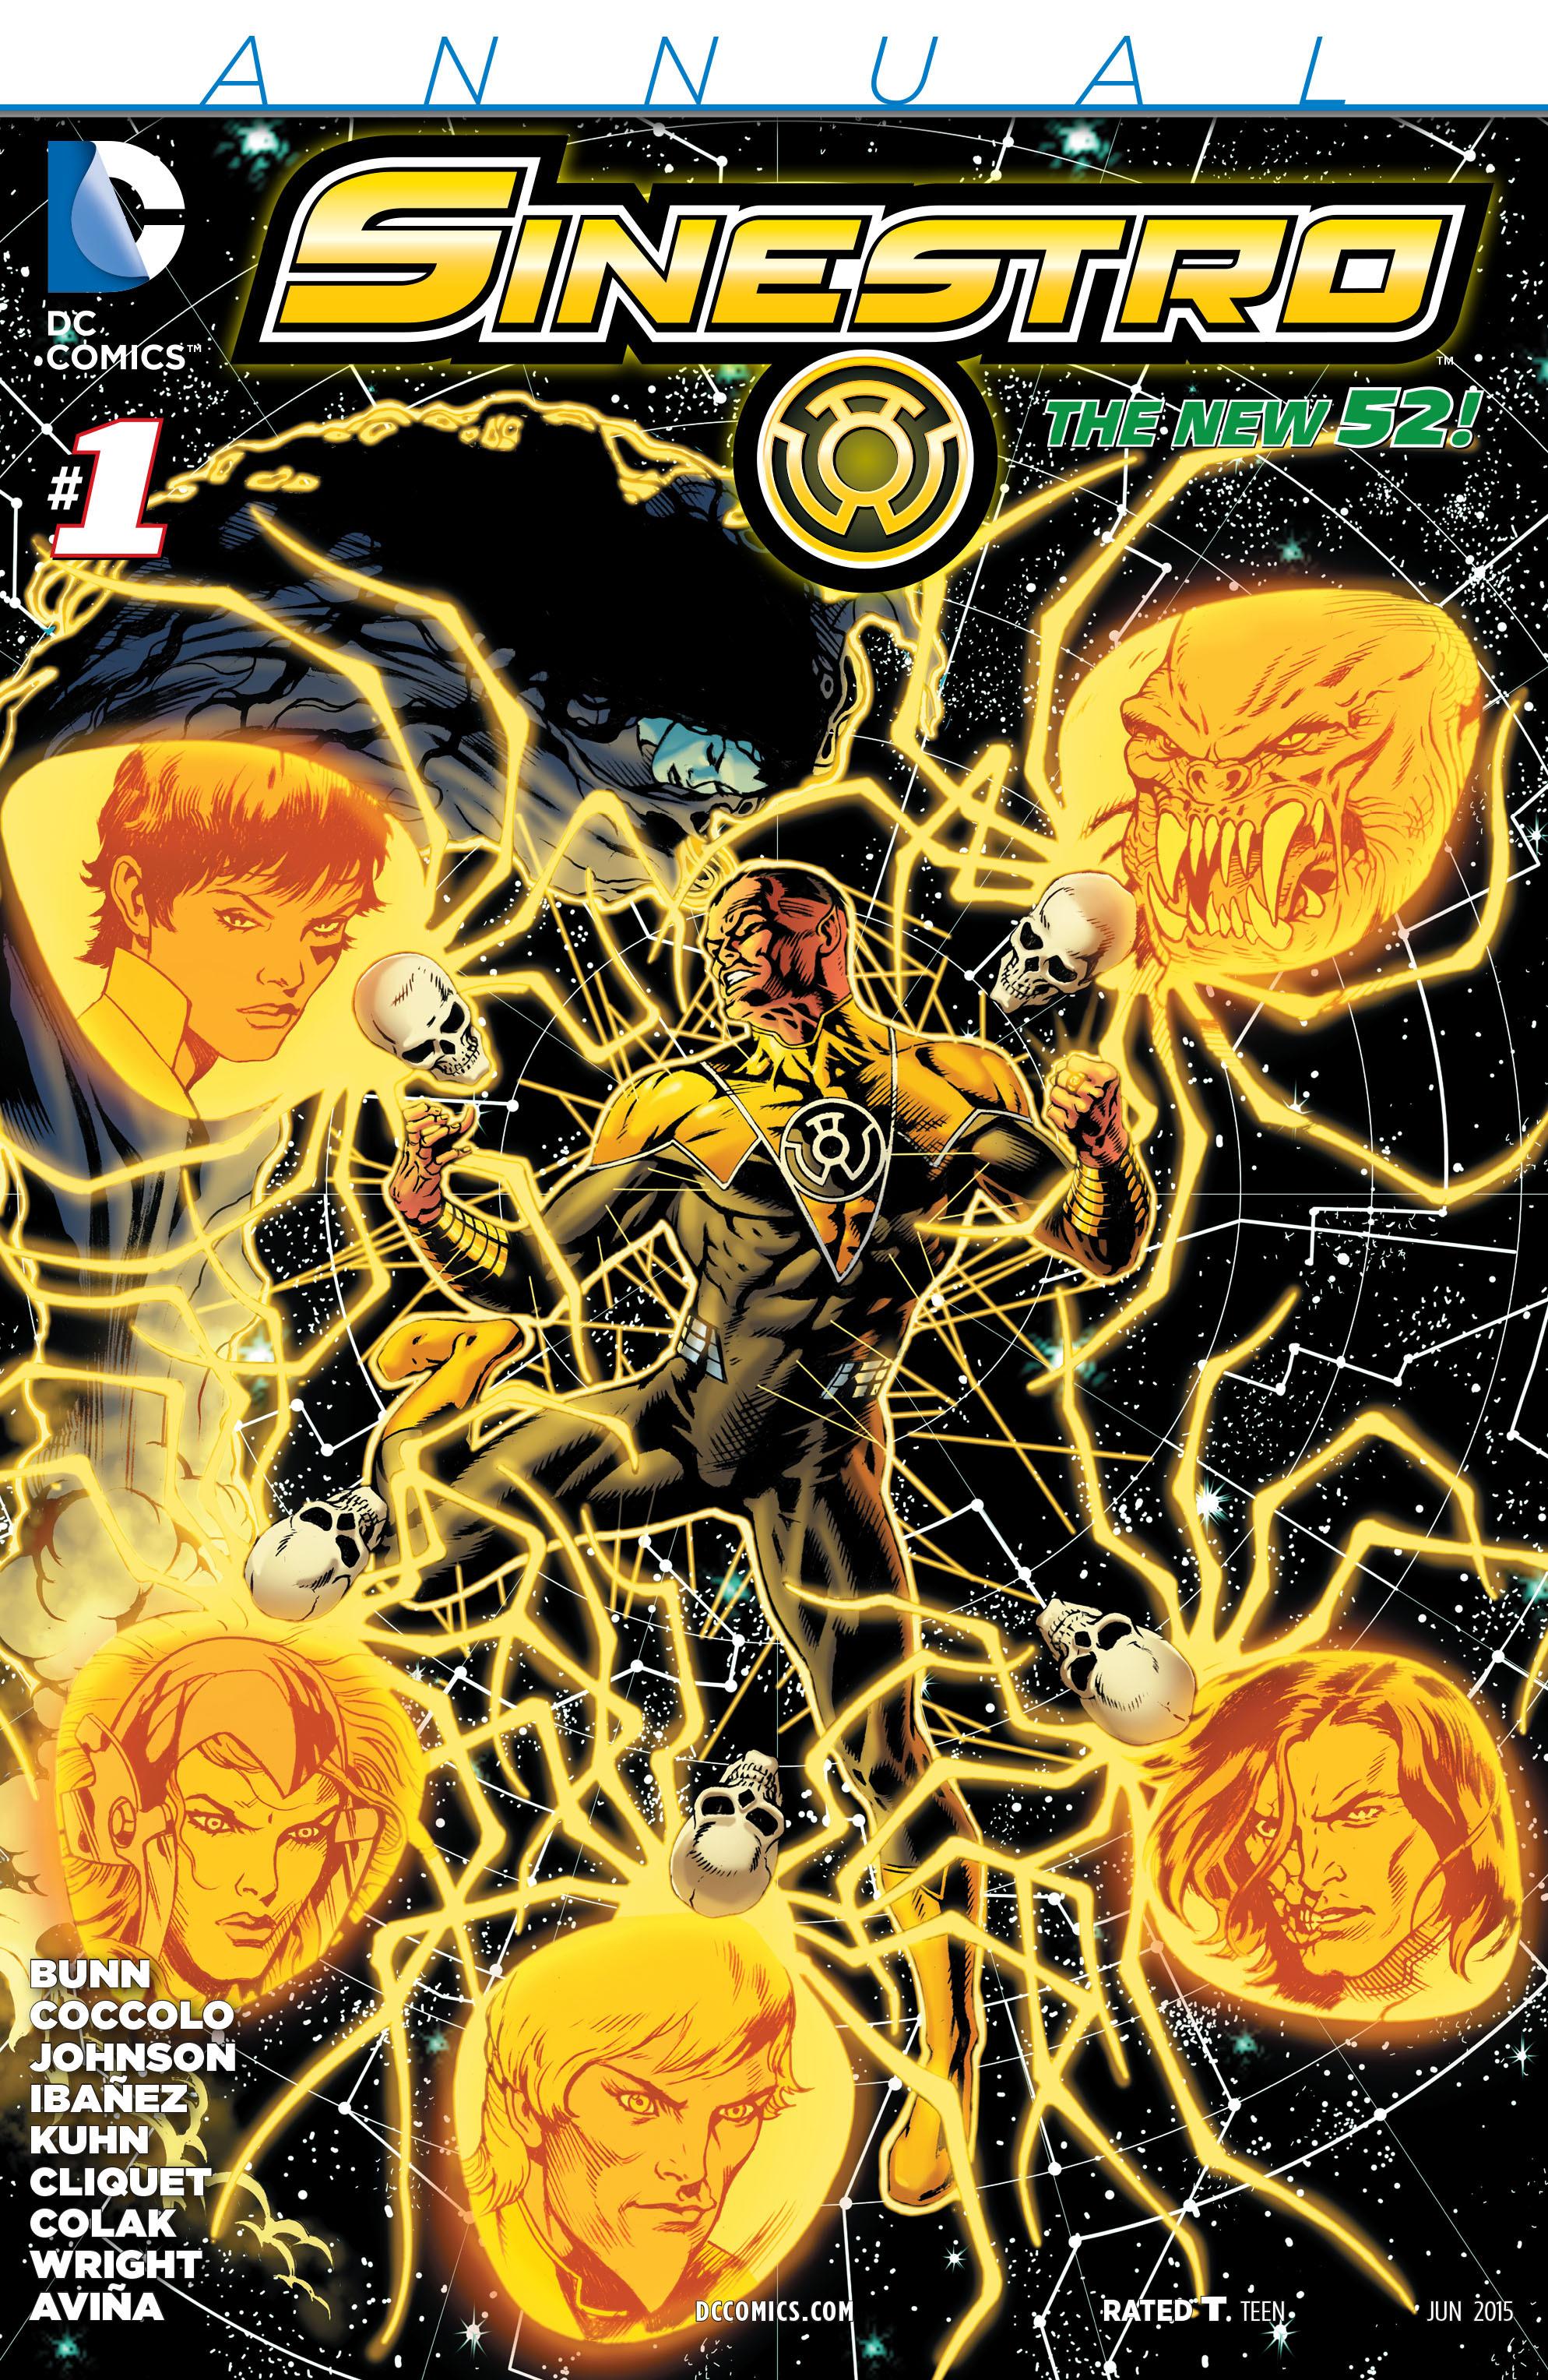 Read online Sinestro comic -  Issue # Annual 1 - 1